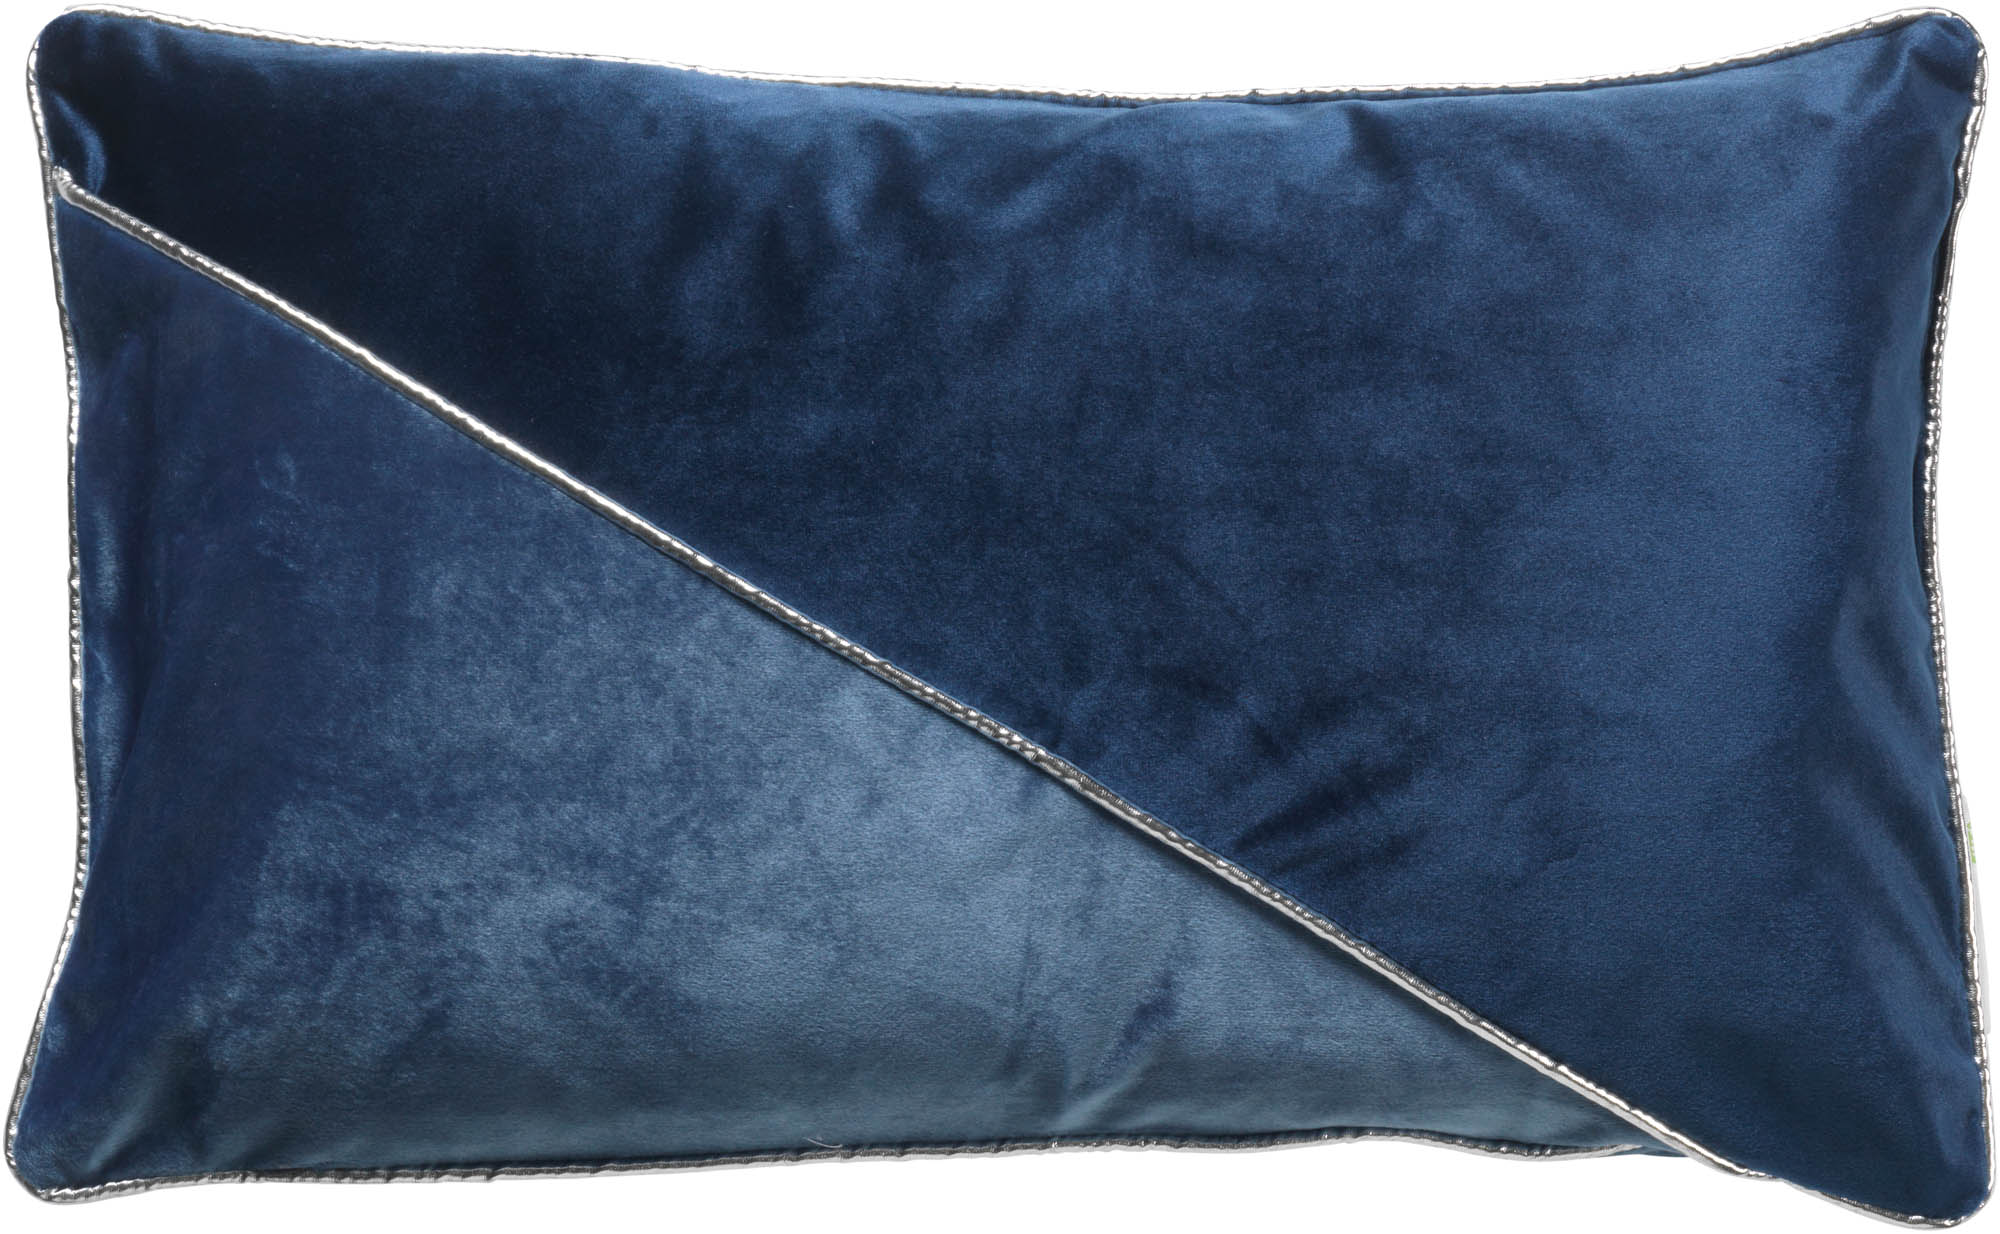 JASPER - Kussenhoes blauw 30x50 cm